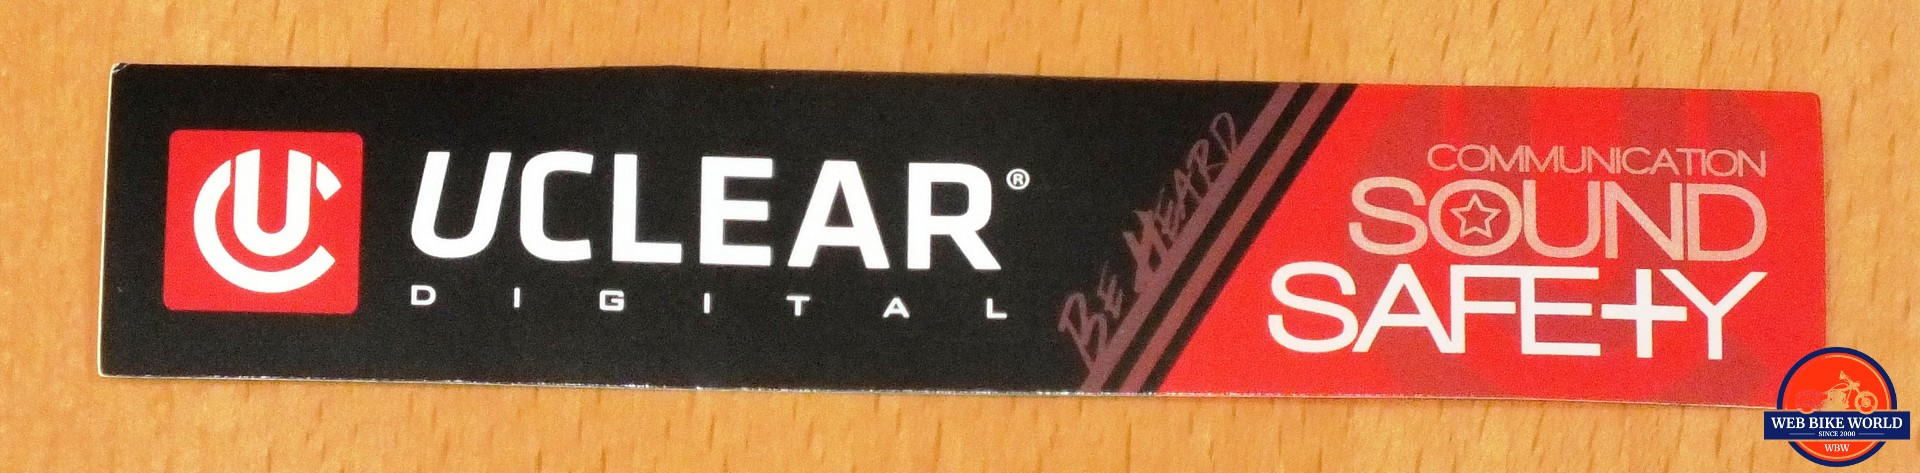 UClear Statement Sticker - Communication, Sound, & Safety